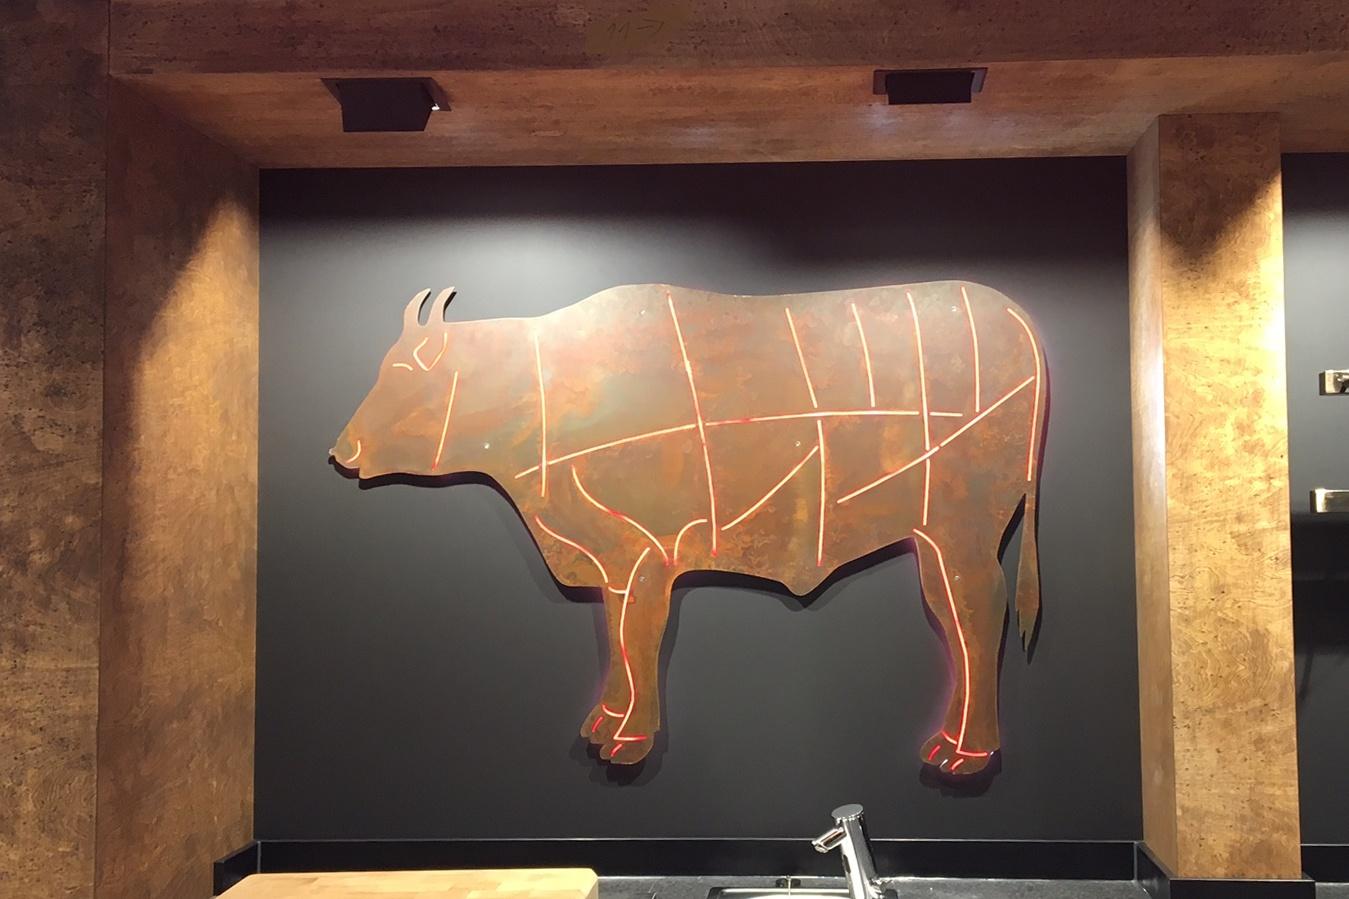 Hinterleuchtete LED-Kuh